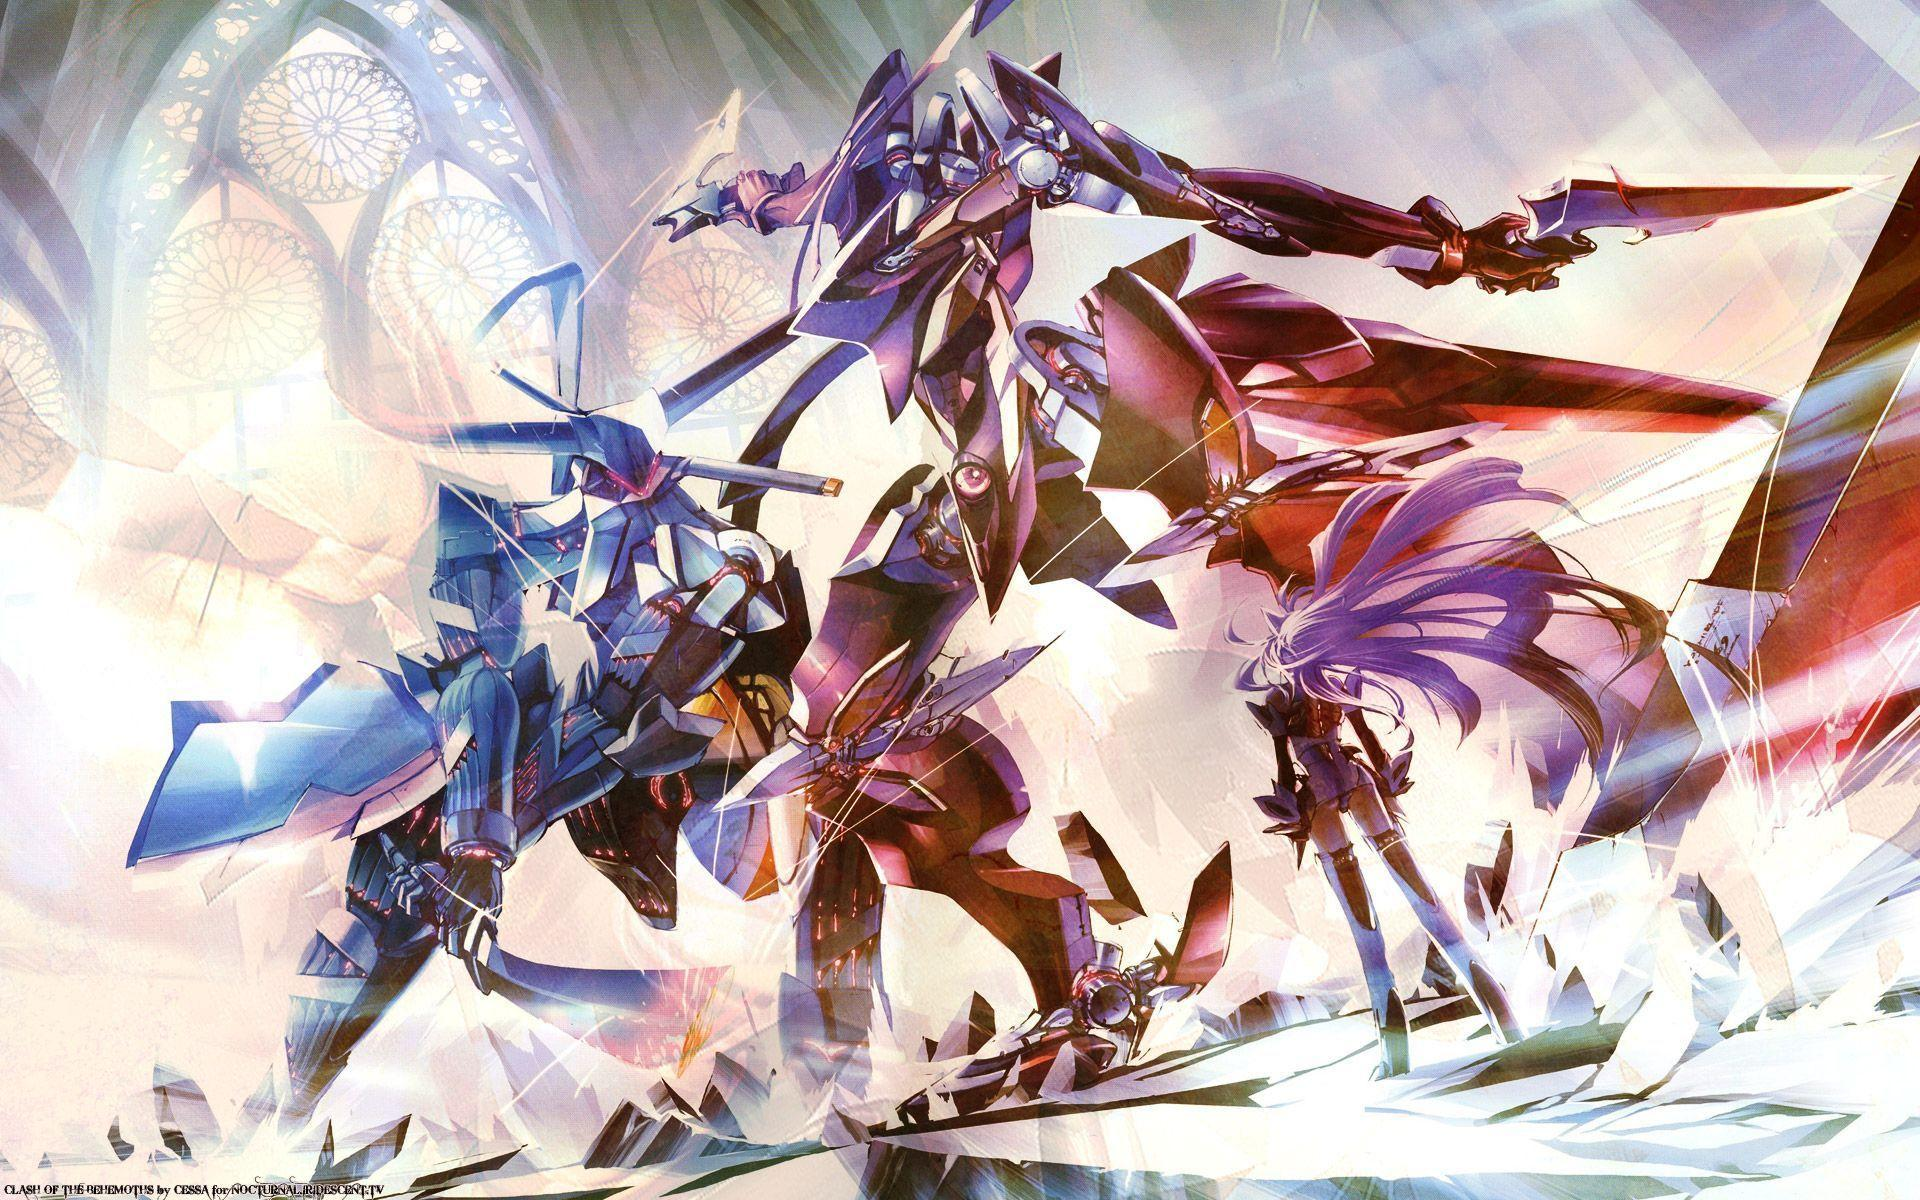 Cybernetic Girls Hd Wallpaper Xenosaga Wallpapers Wallpaper Cave